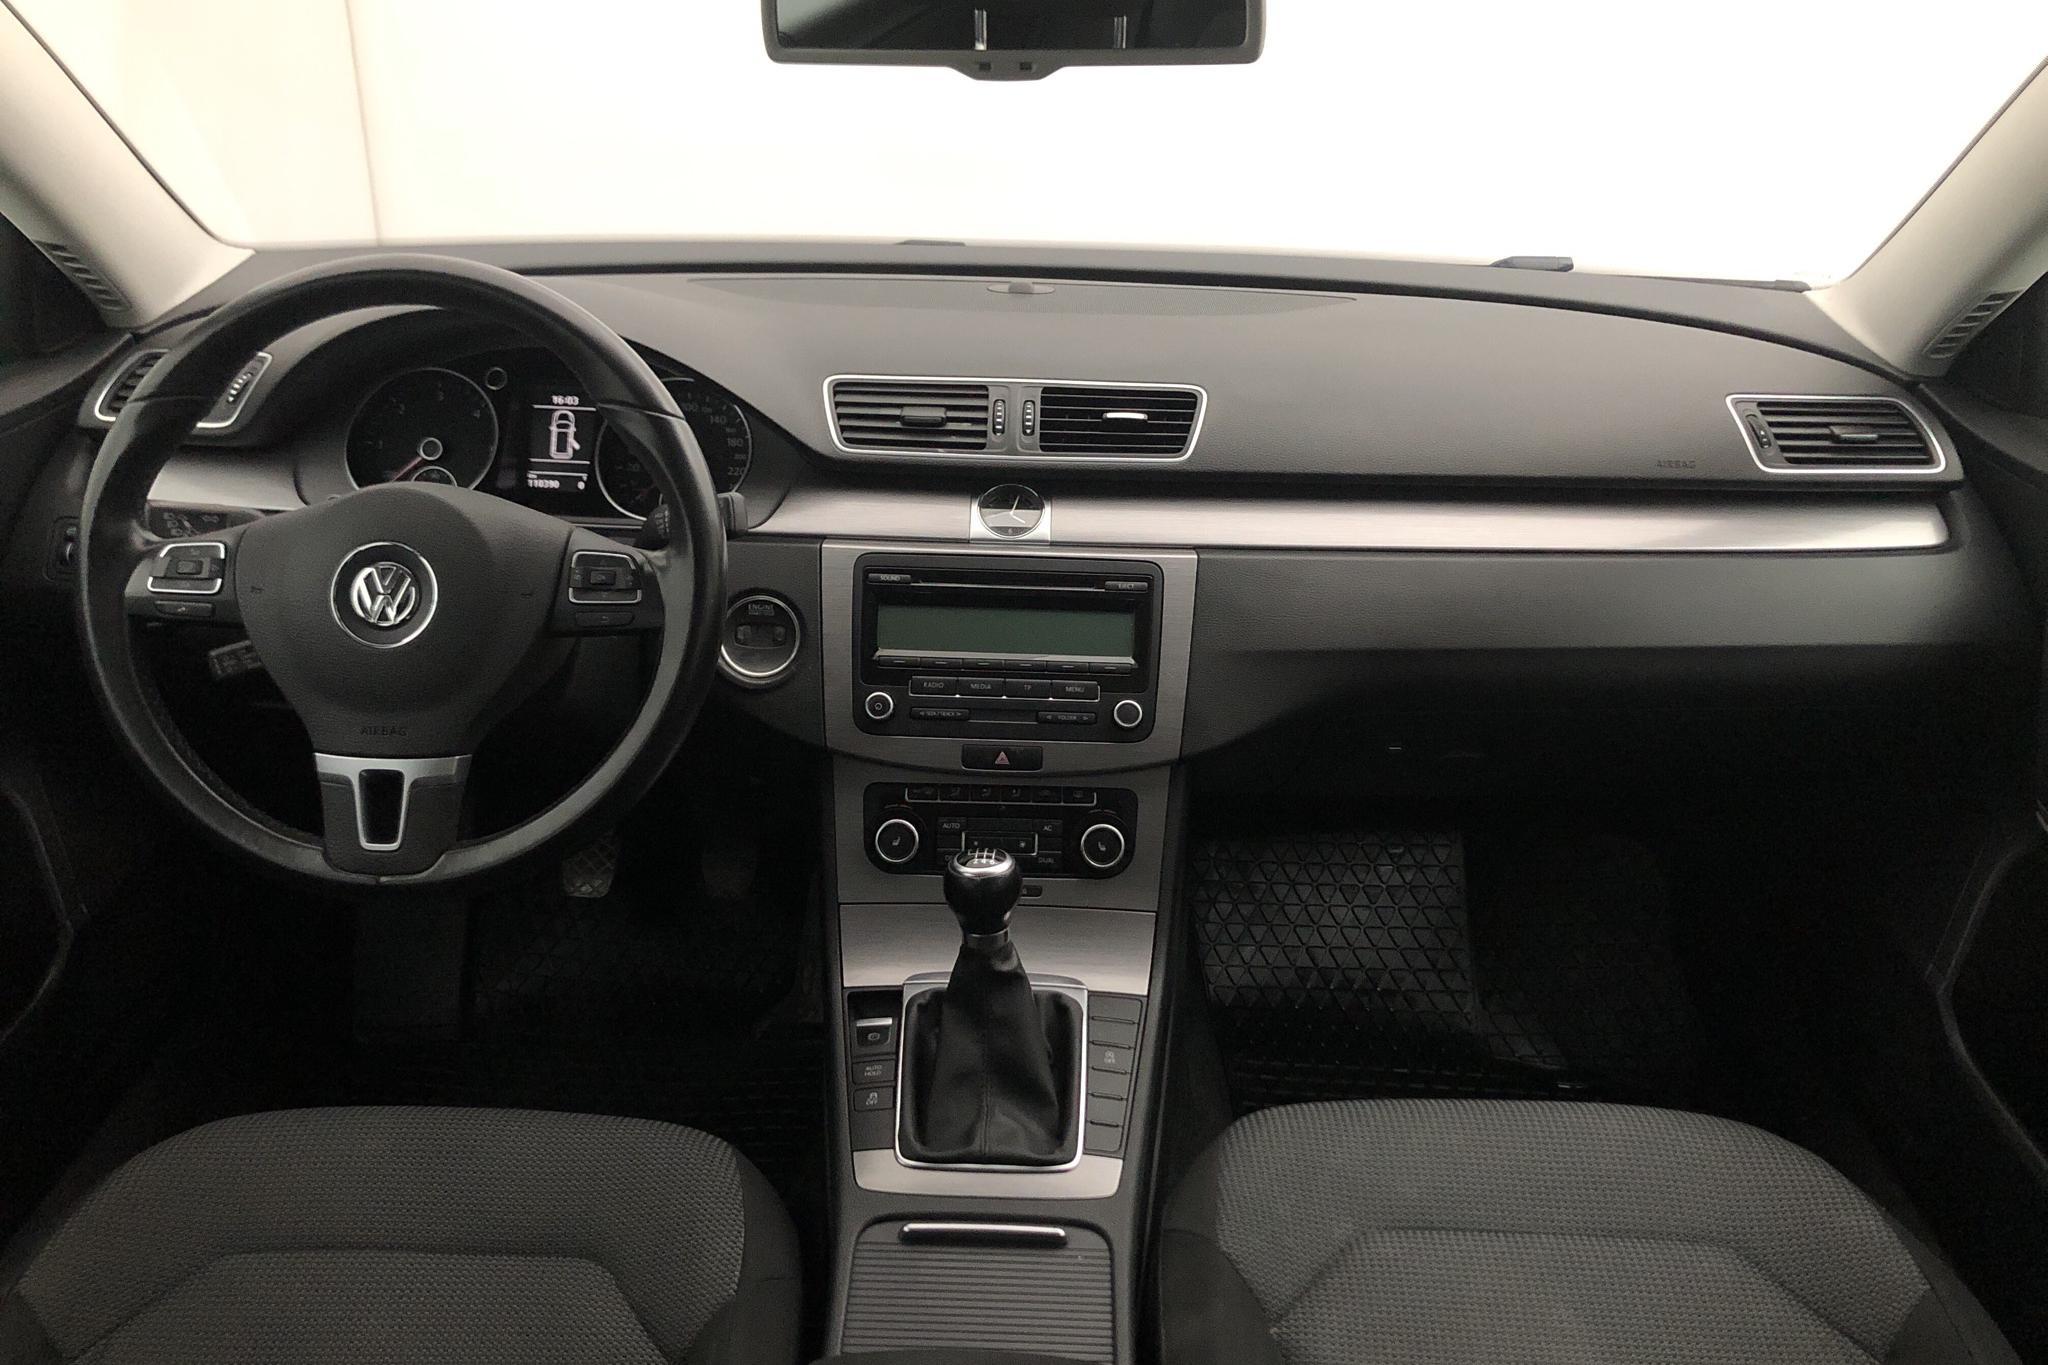 VW Passat 2.0 TDI BlueMotion Technology Variant (140hk) - 11 038 mil - Manuell - Light Grey - 2011